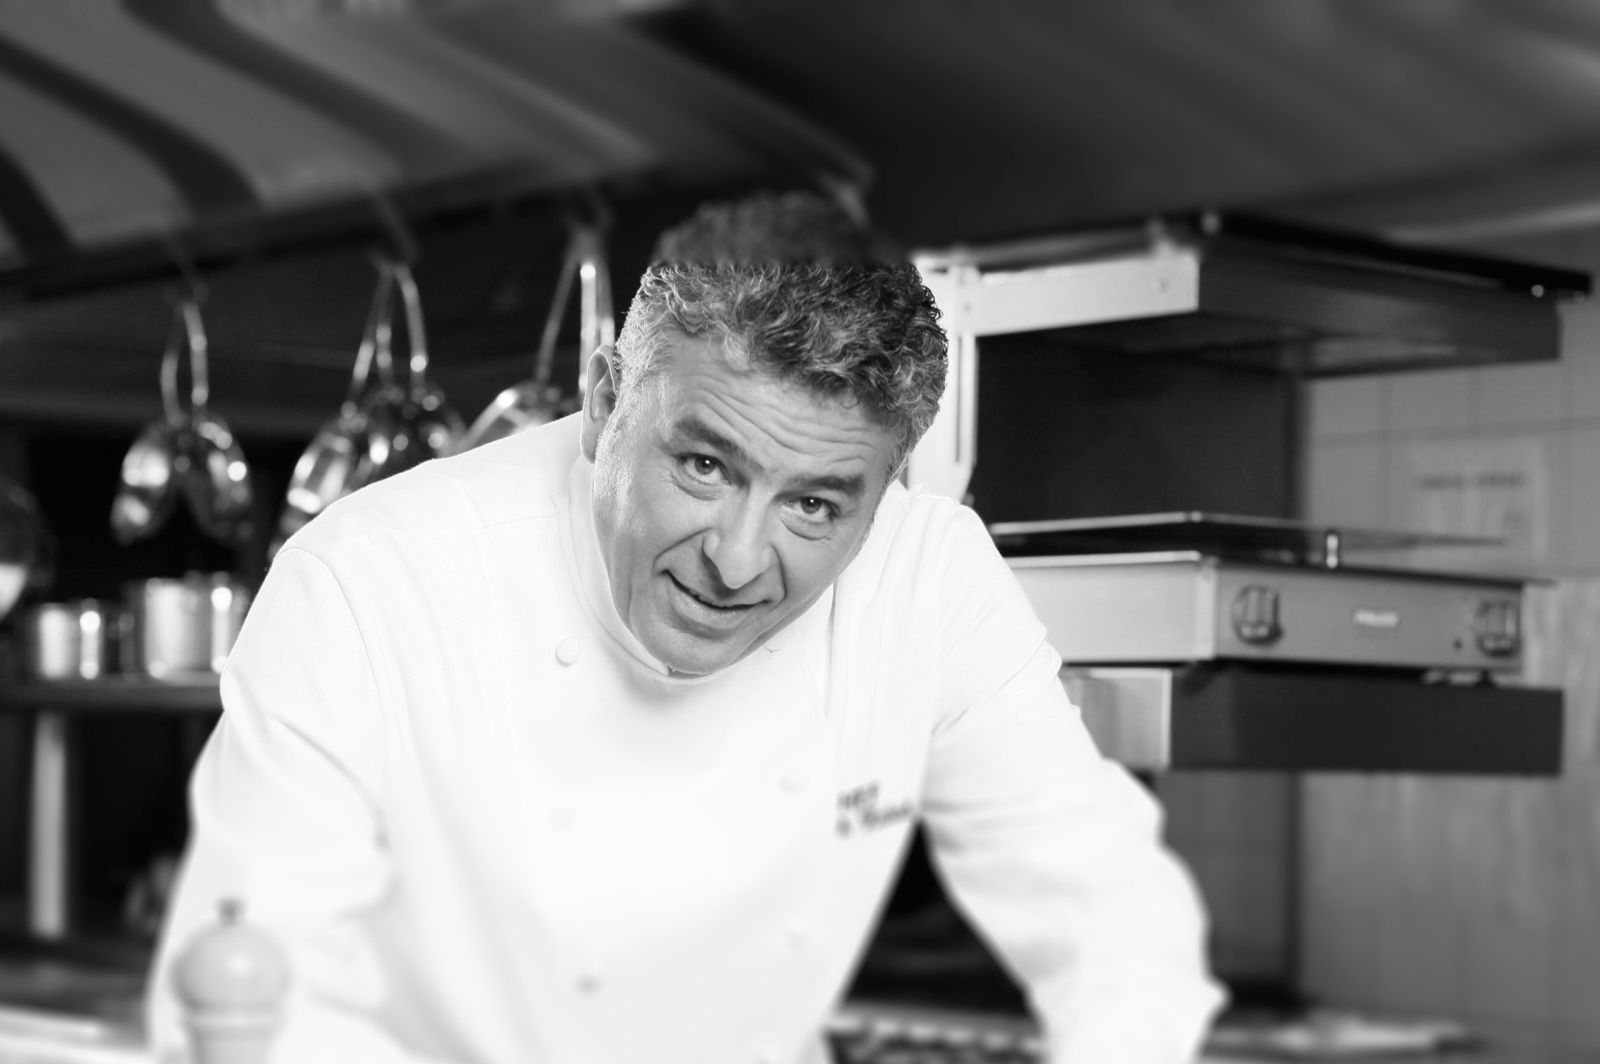 Chef Joseph Hadad as pictured on the josephrestaurant.ro website.